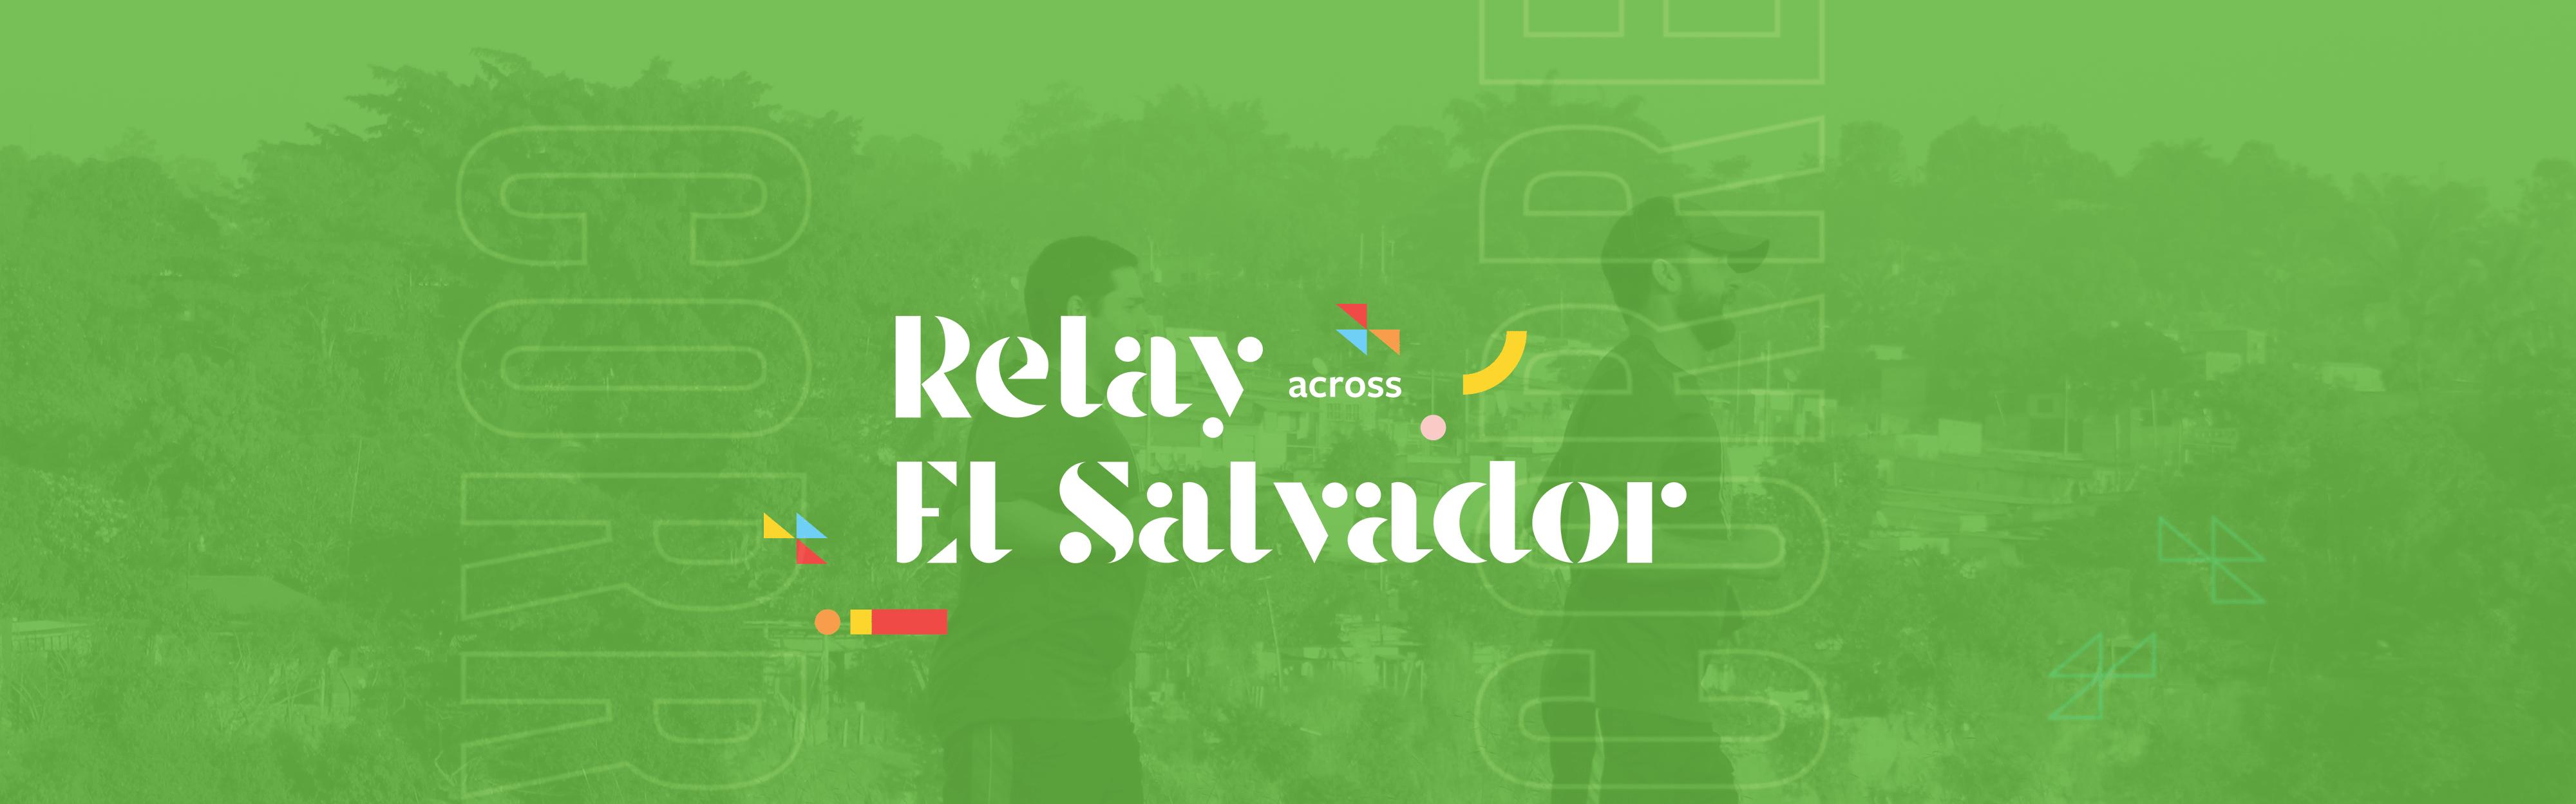 Relay AcrossEl Salvador